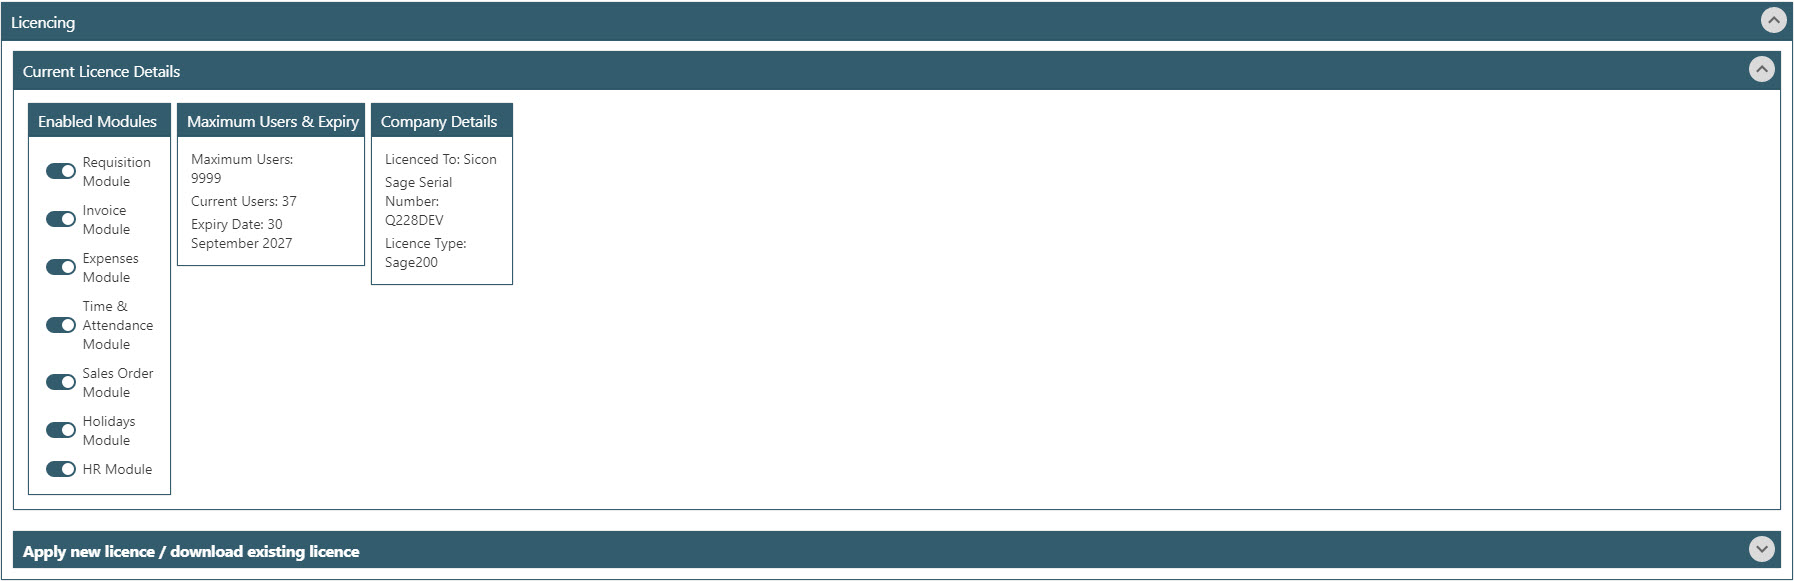 WAP Timesheets help and user guide - Timesheet HUG Section 2 Image 1